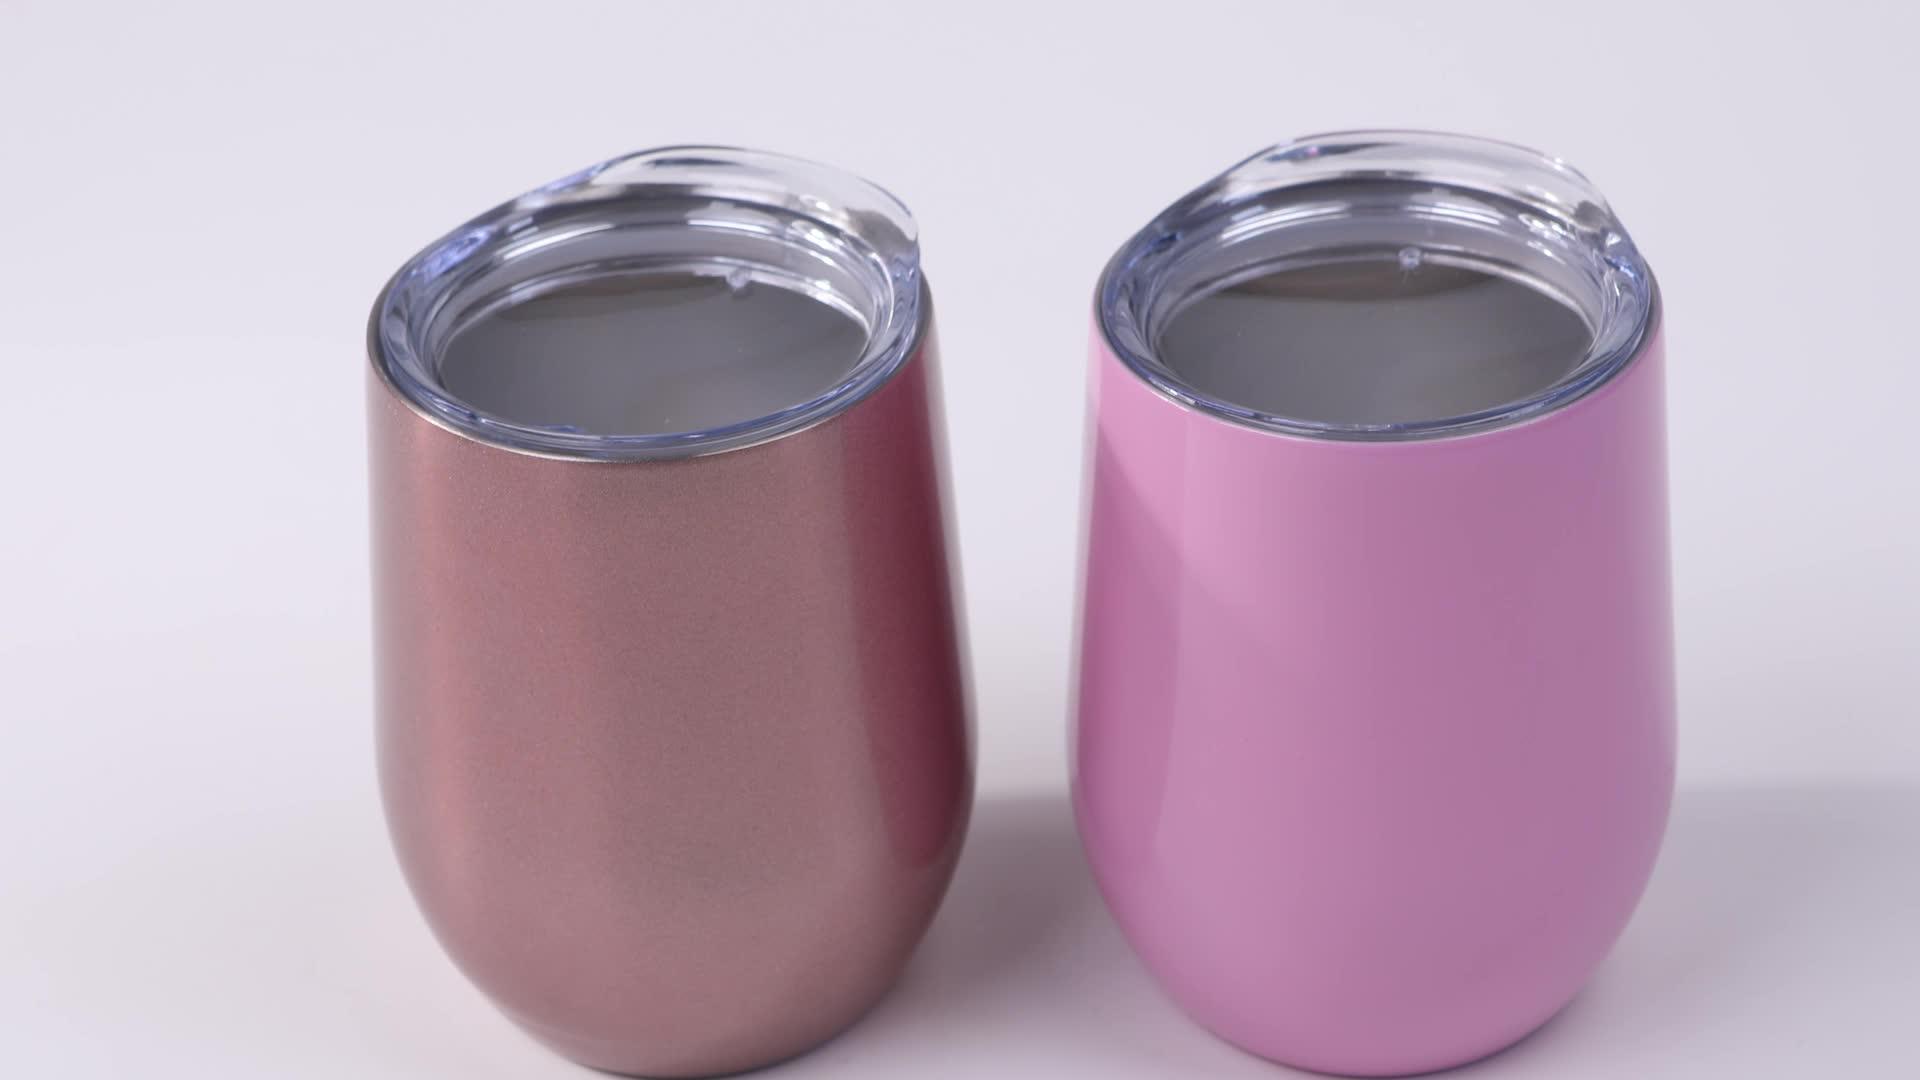 12Oz Wine Insulated Stainless Steel Coffee Tumbler Cup Mug